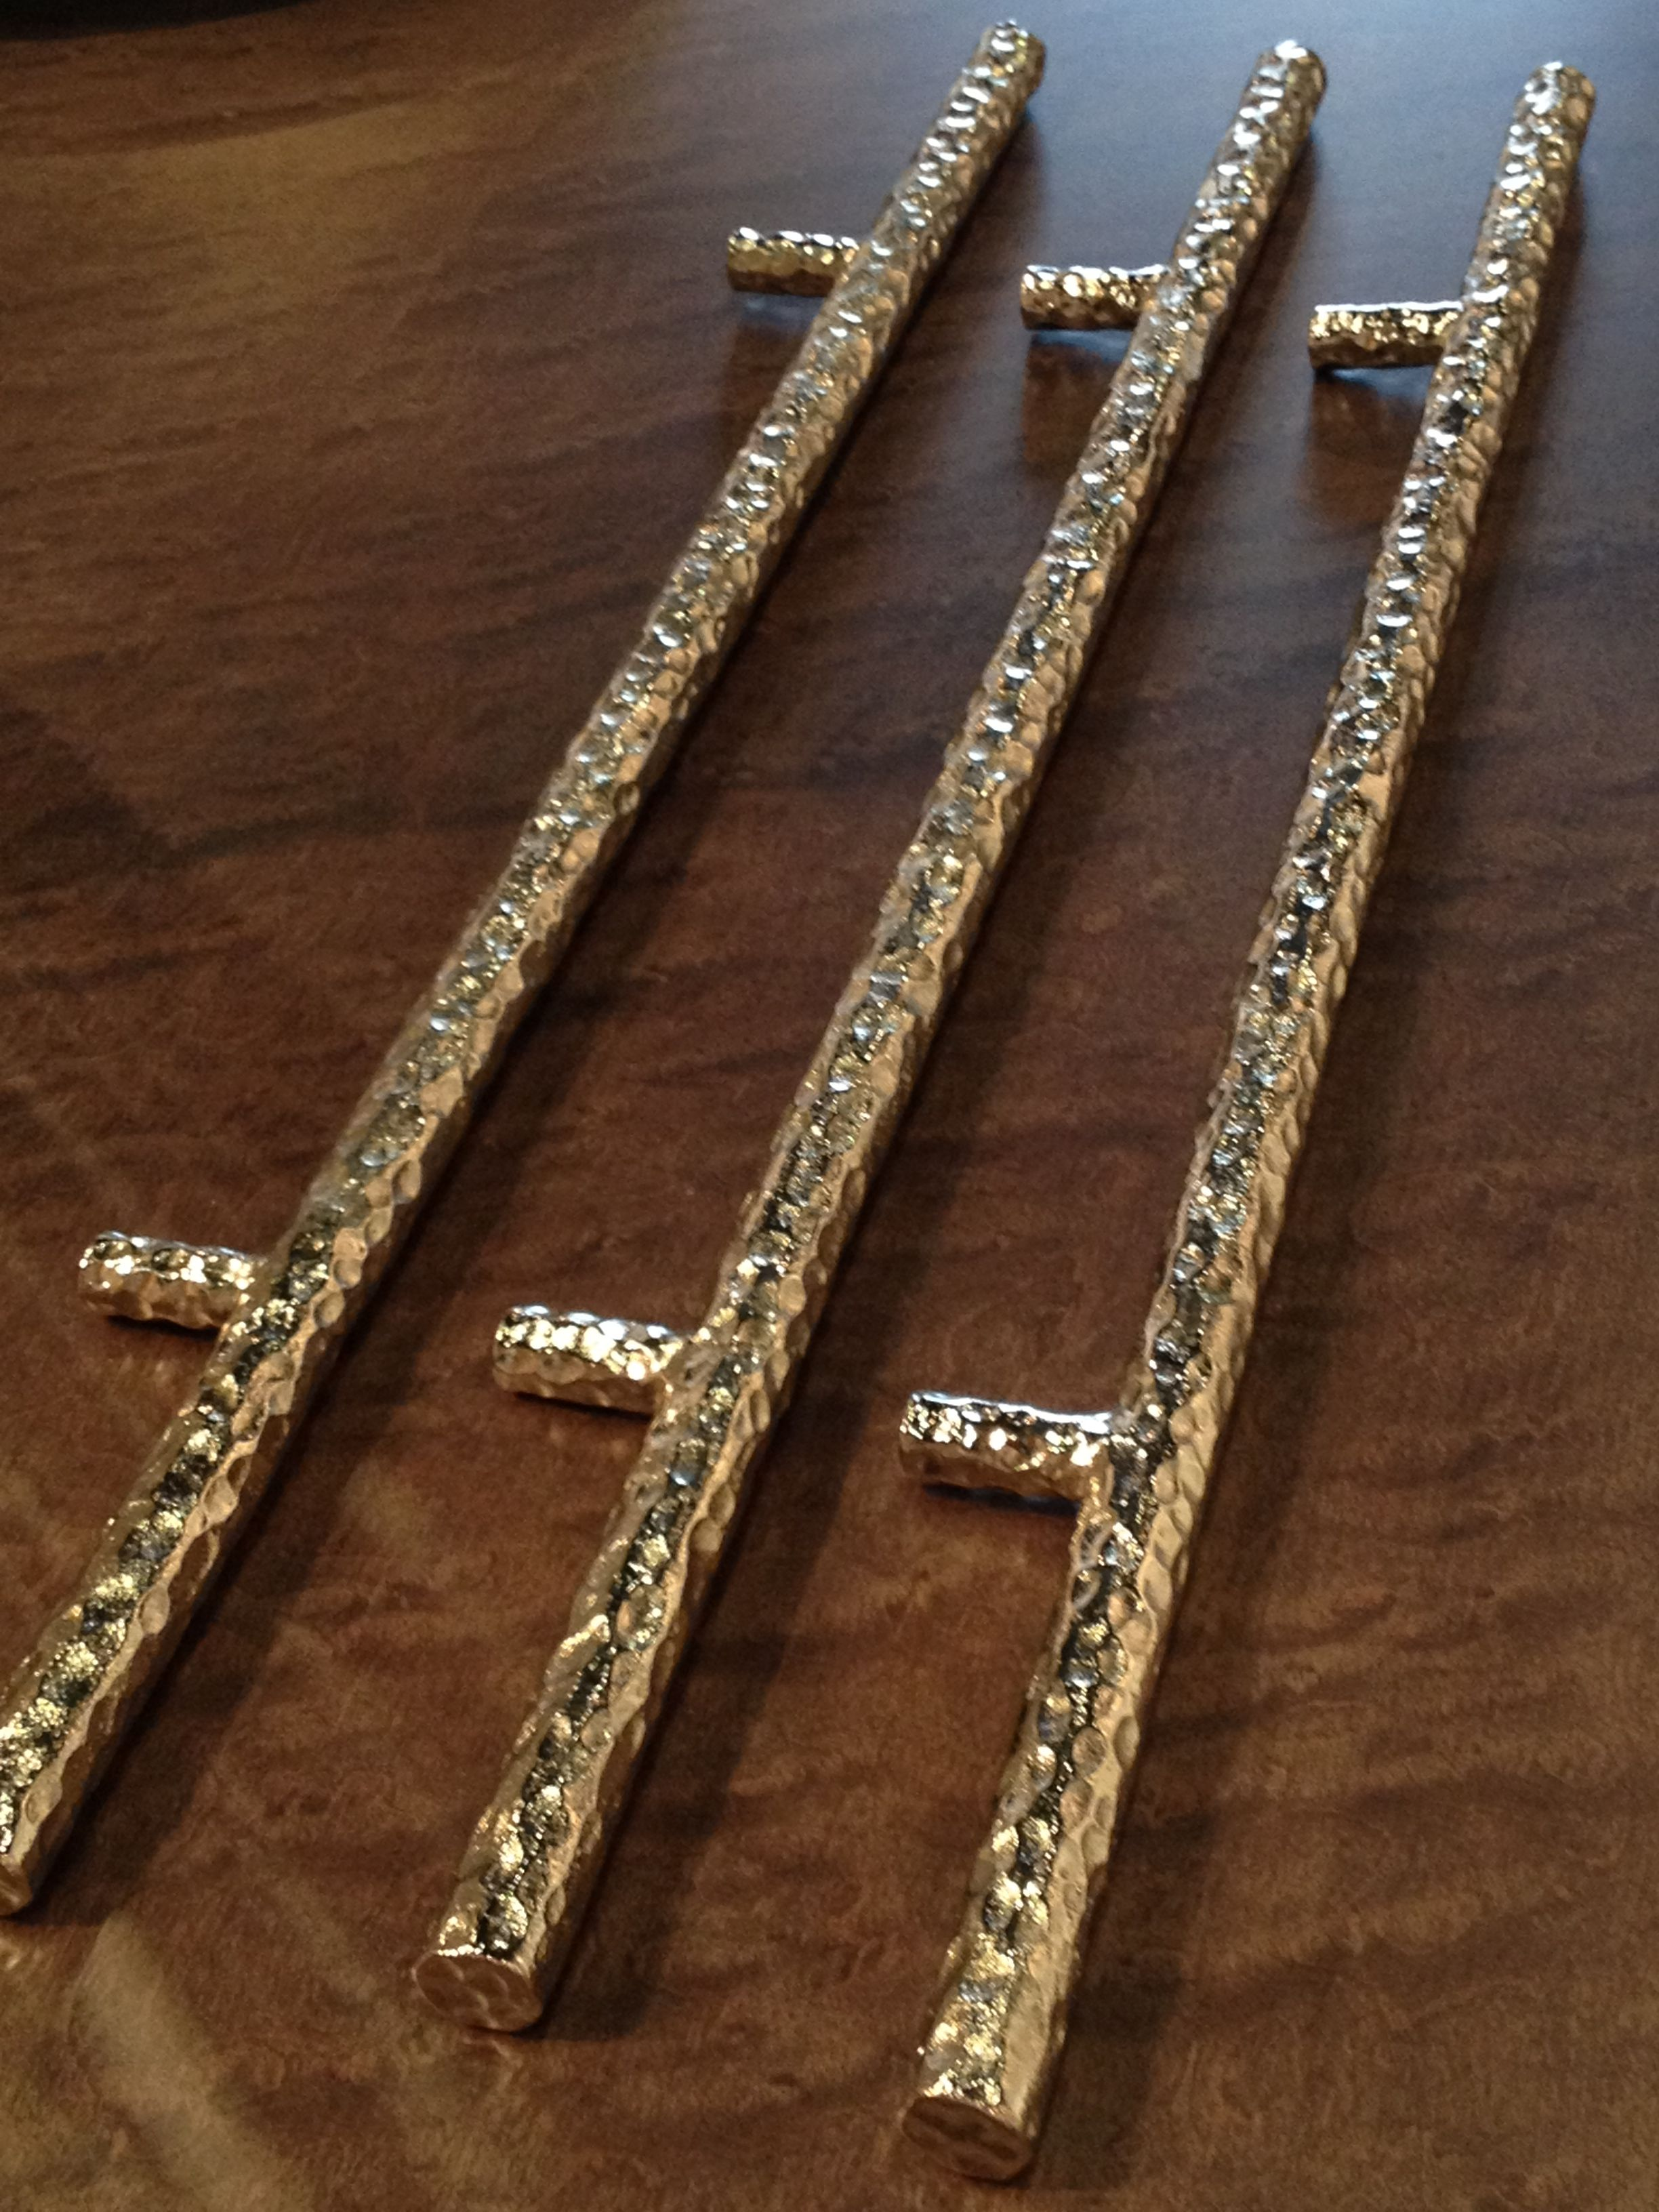 Nickel Plated Handles For Drawers In Showroom Dvernye Ruchki